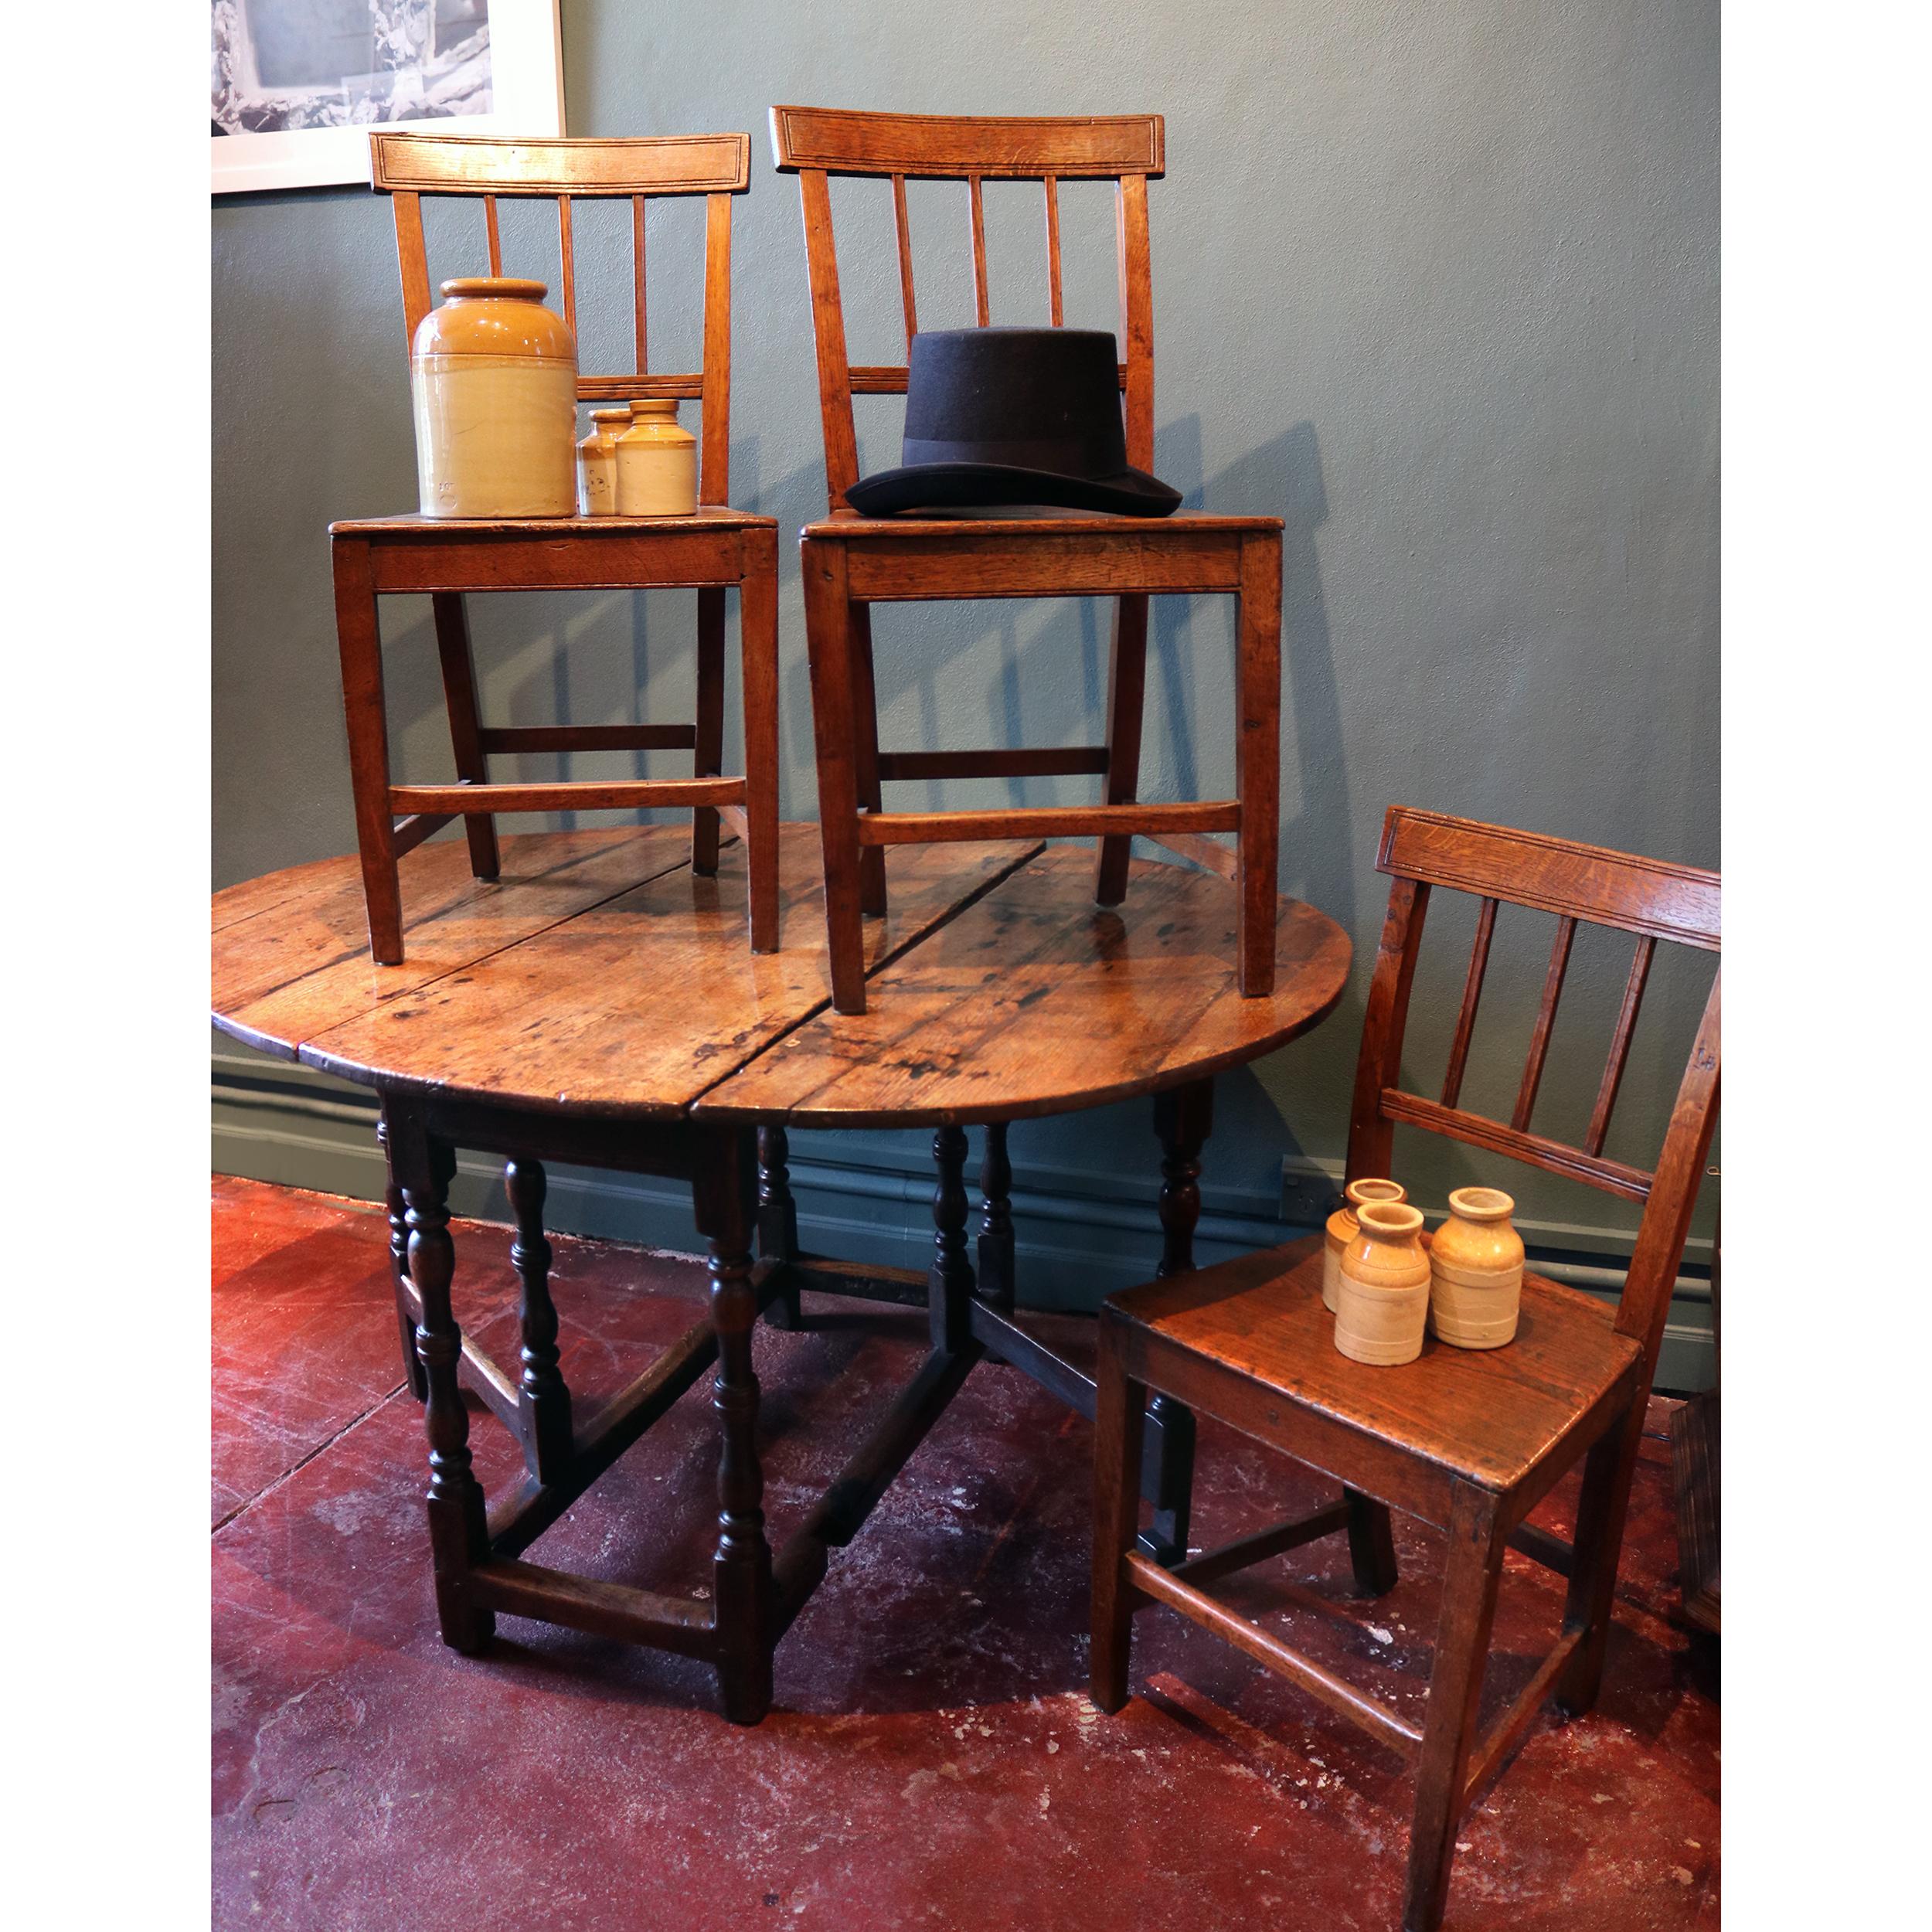 welsh chairs.jpg